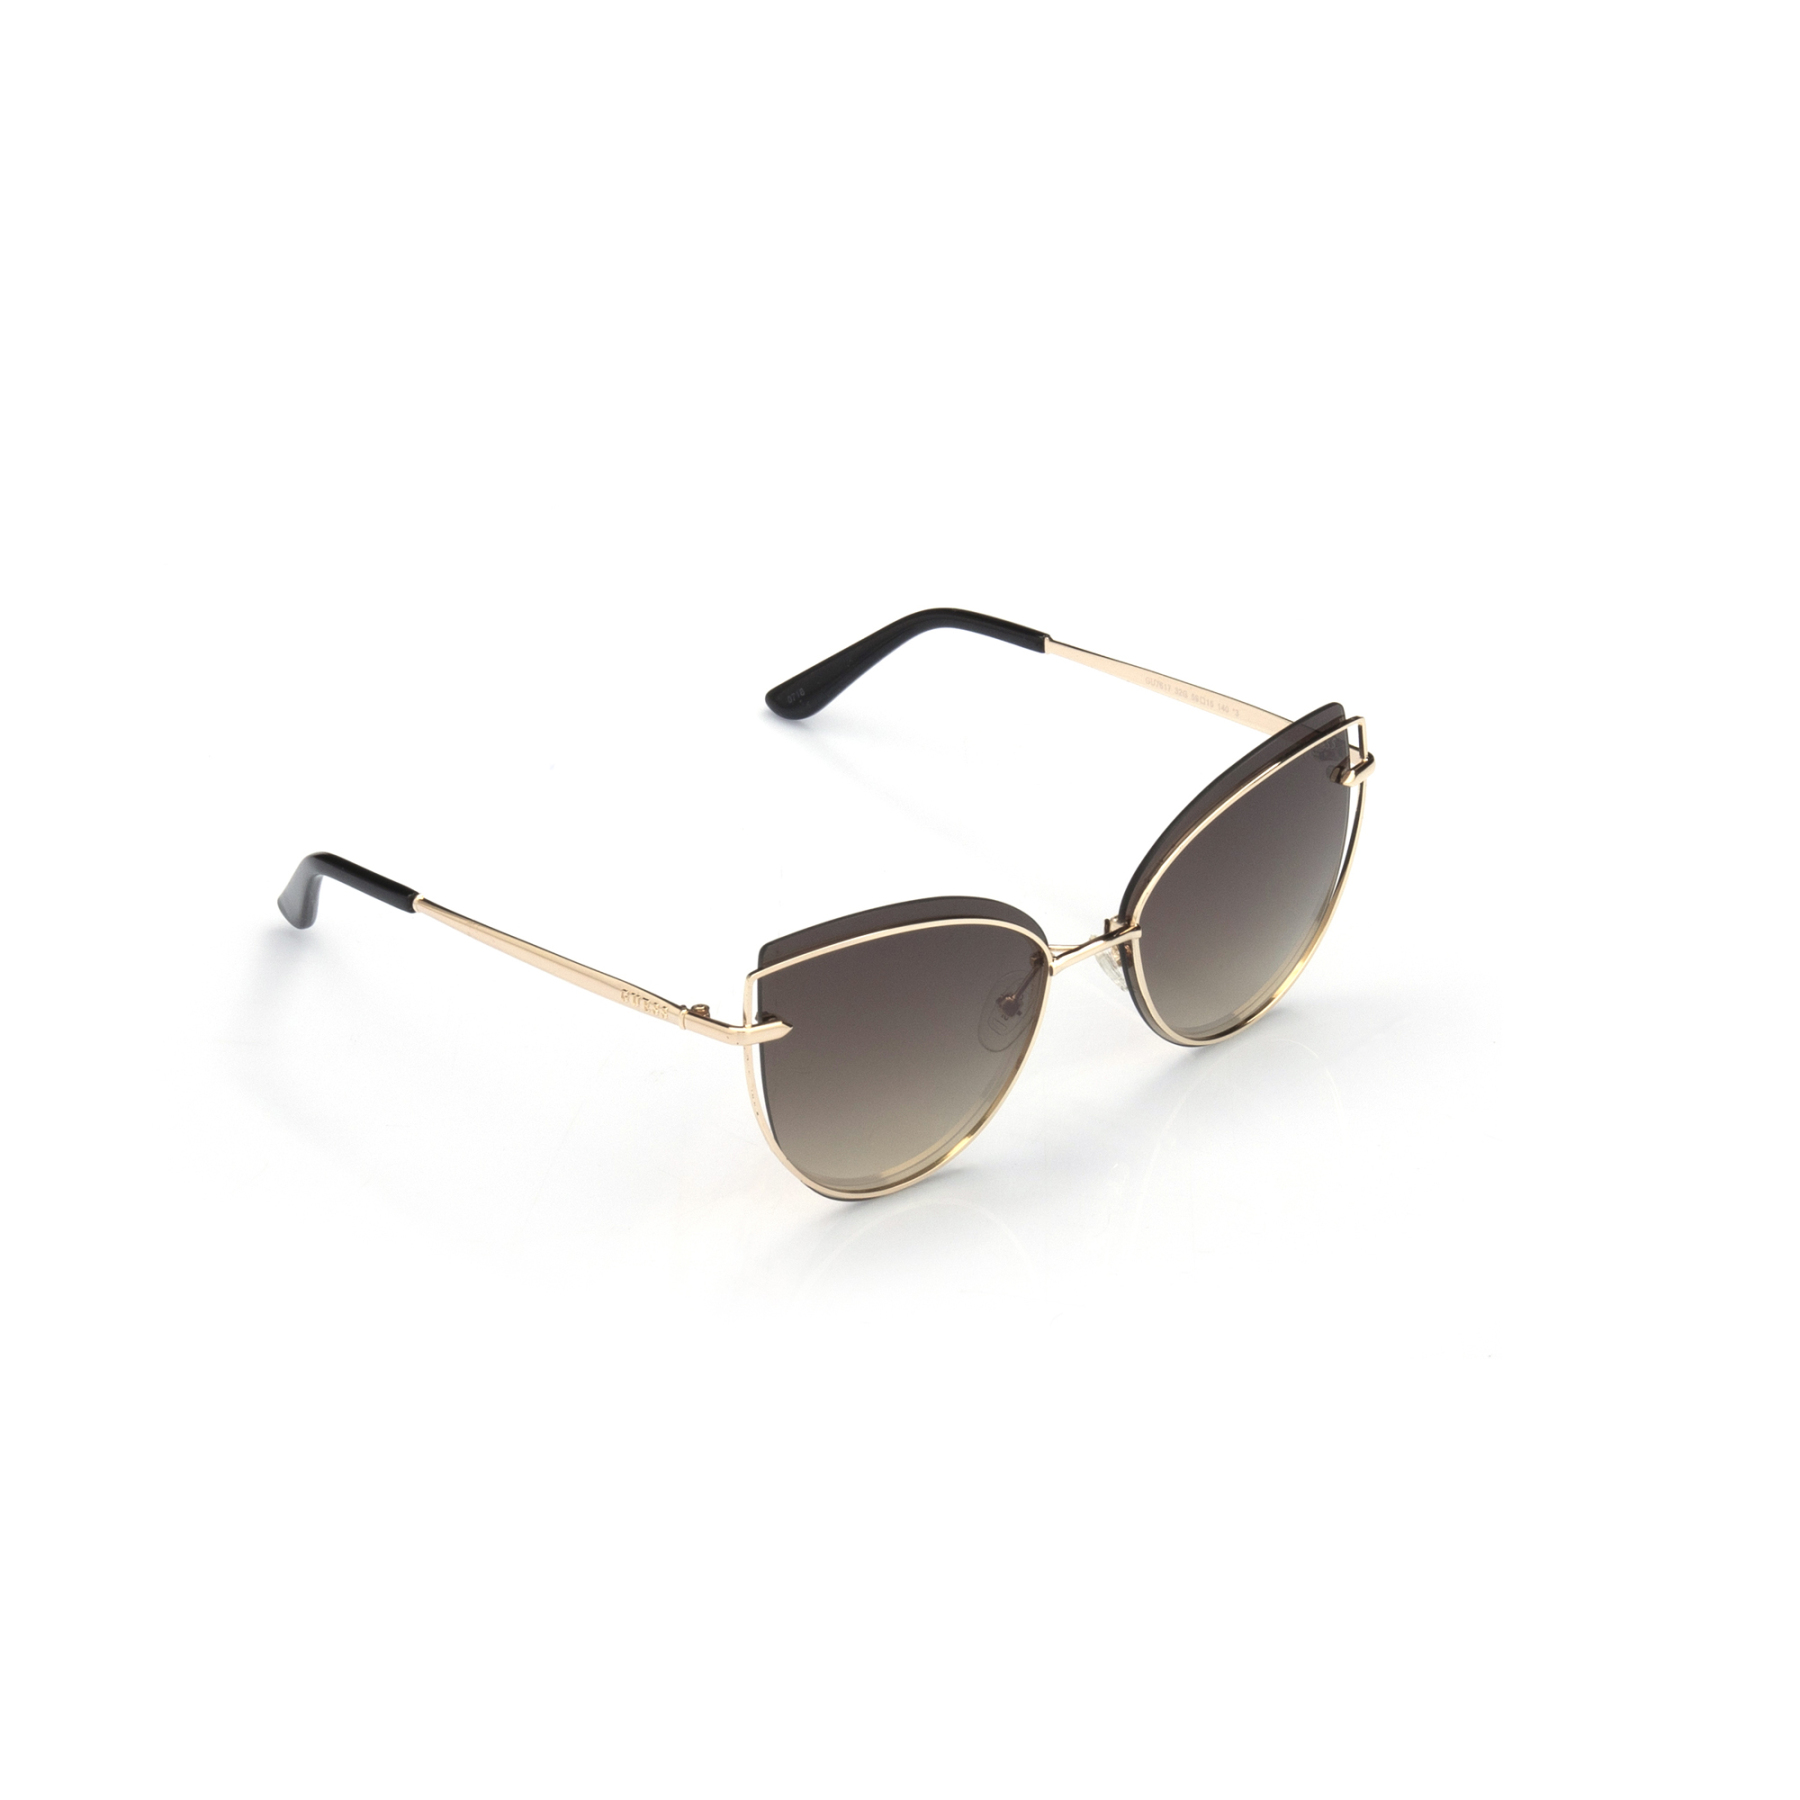 Women's sunglasses gu 7617 32g metal gold organic butterfly cat eye 59-15-140 guess